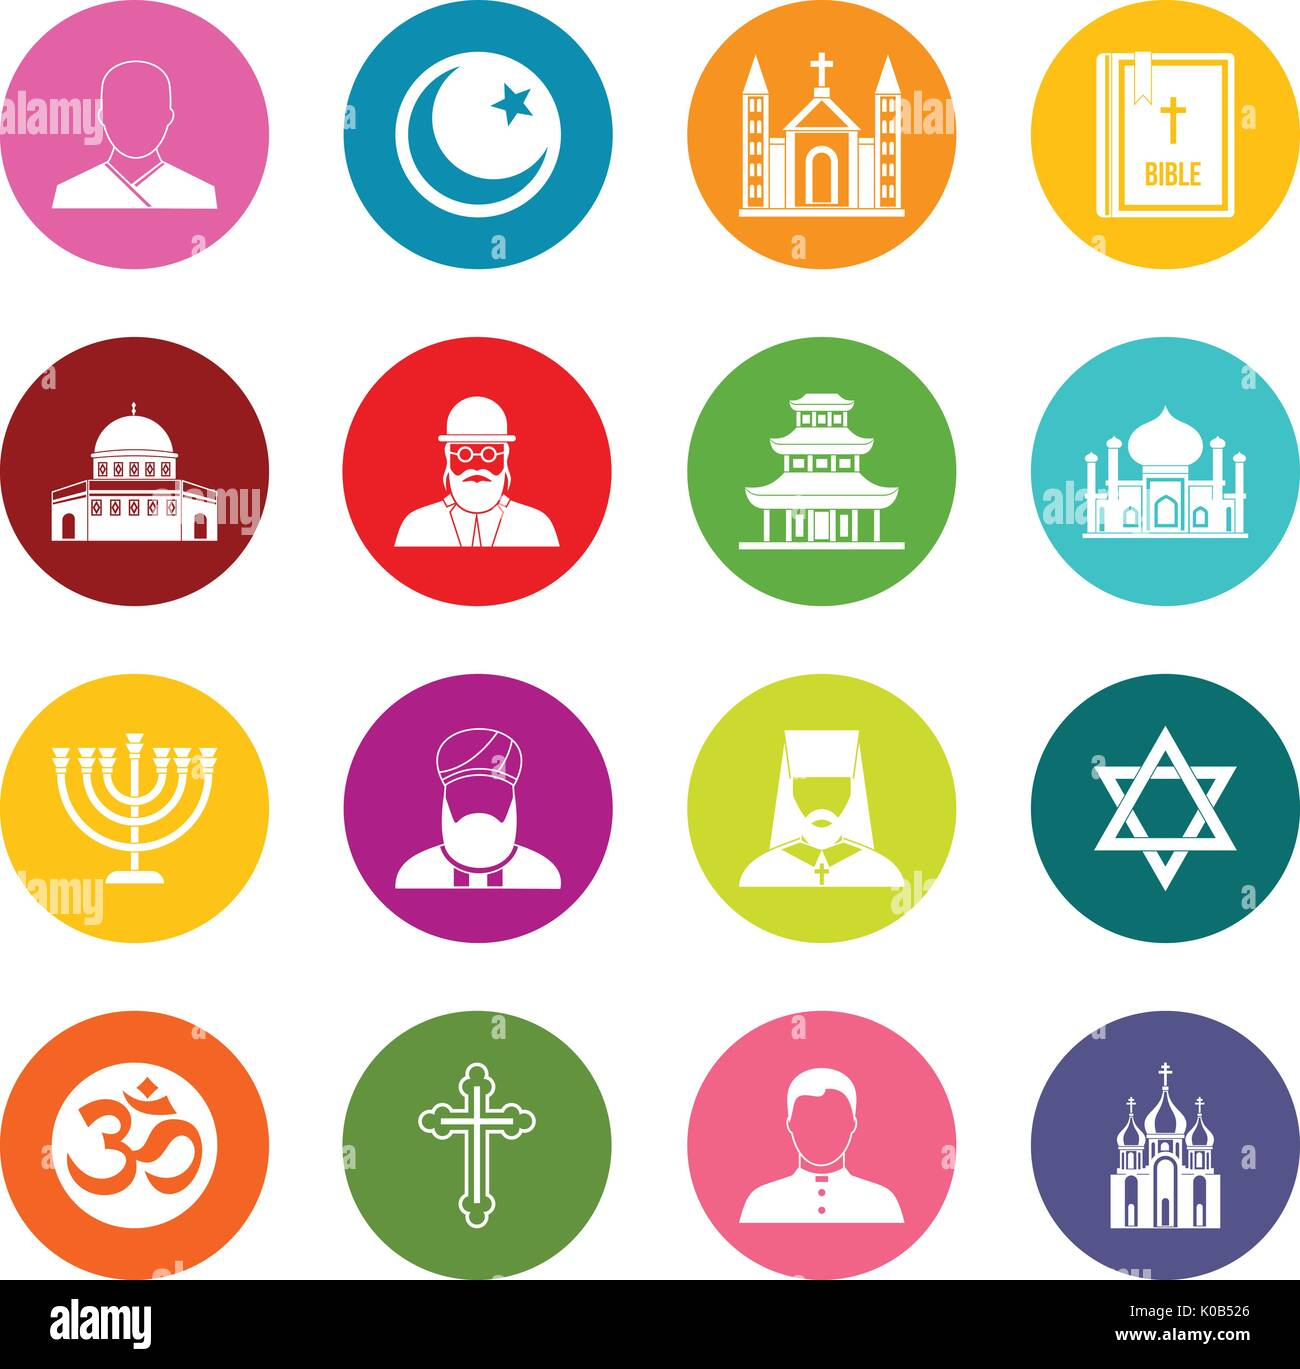 Hindu muslim christian stock photos hindu muslim christian stock religious symbol icons many colors set stock image buycottarizona Image collections